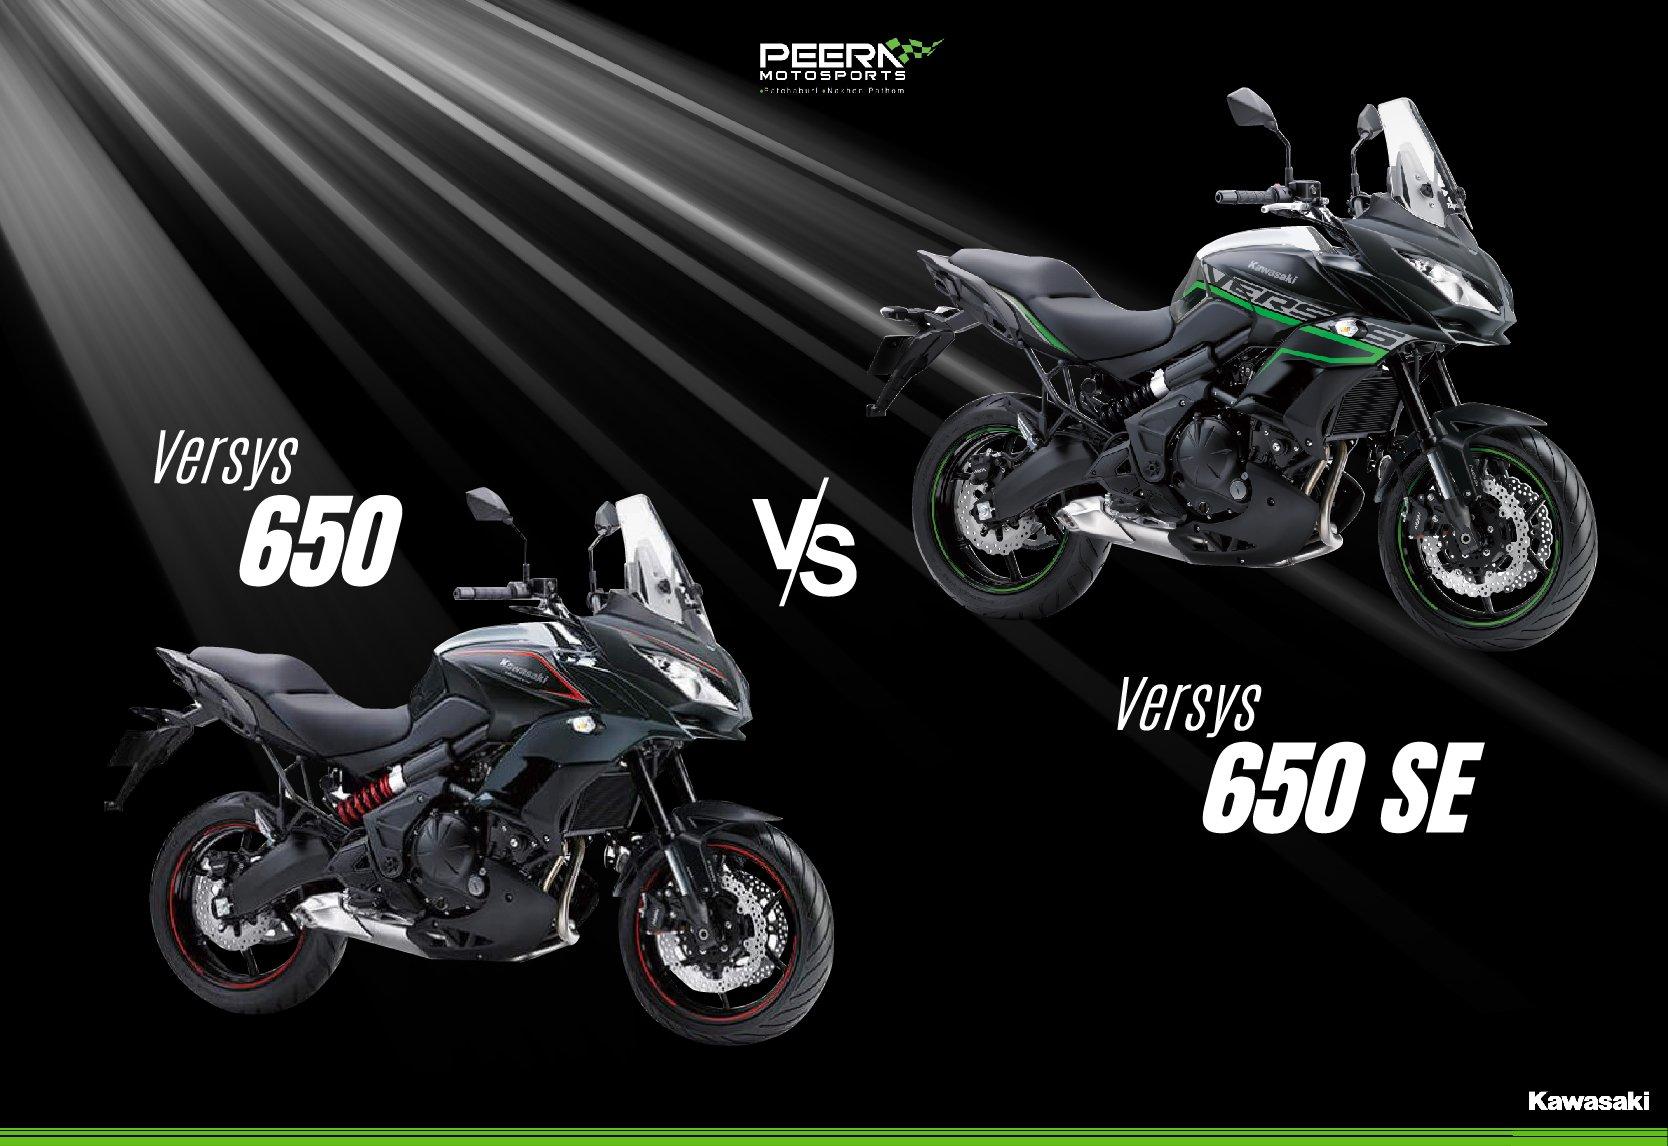 Kawasaki Versys 650 vs Kawasaki Versys 650 SE-01